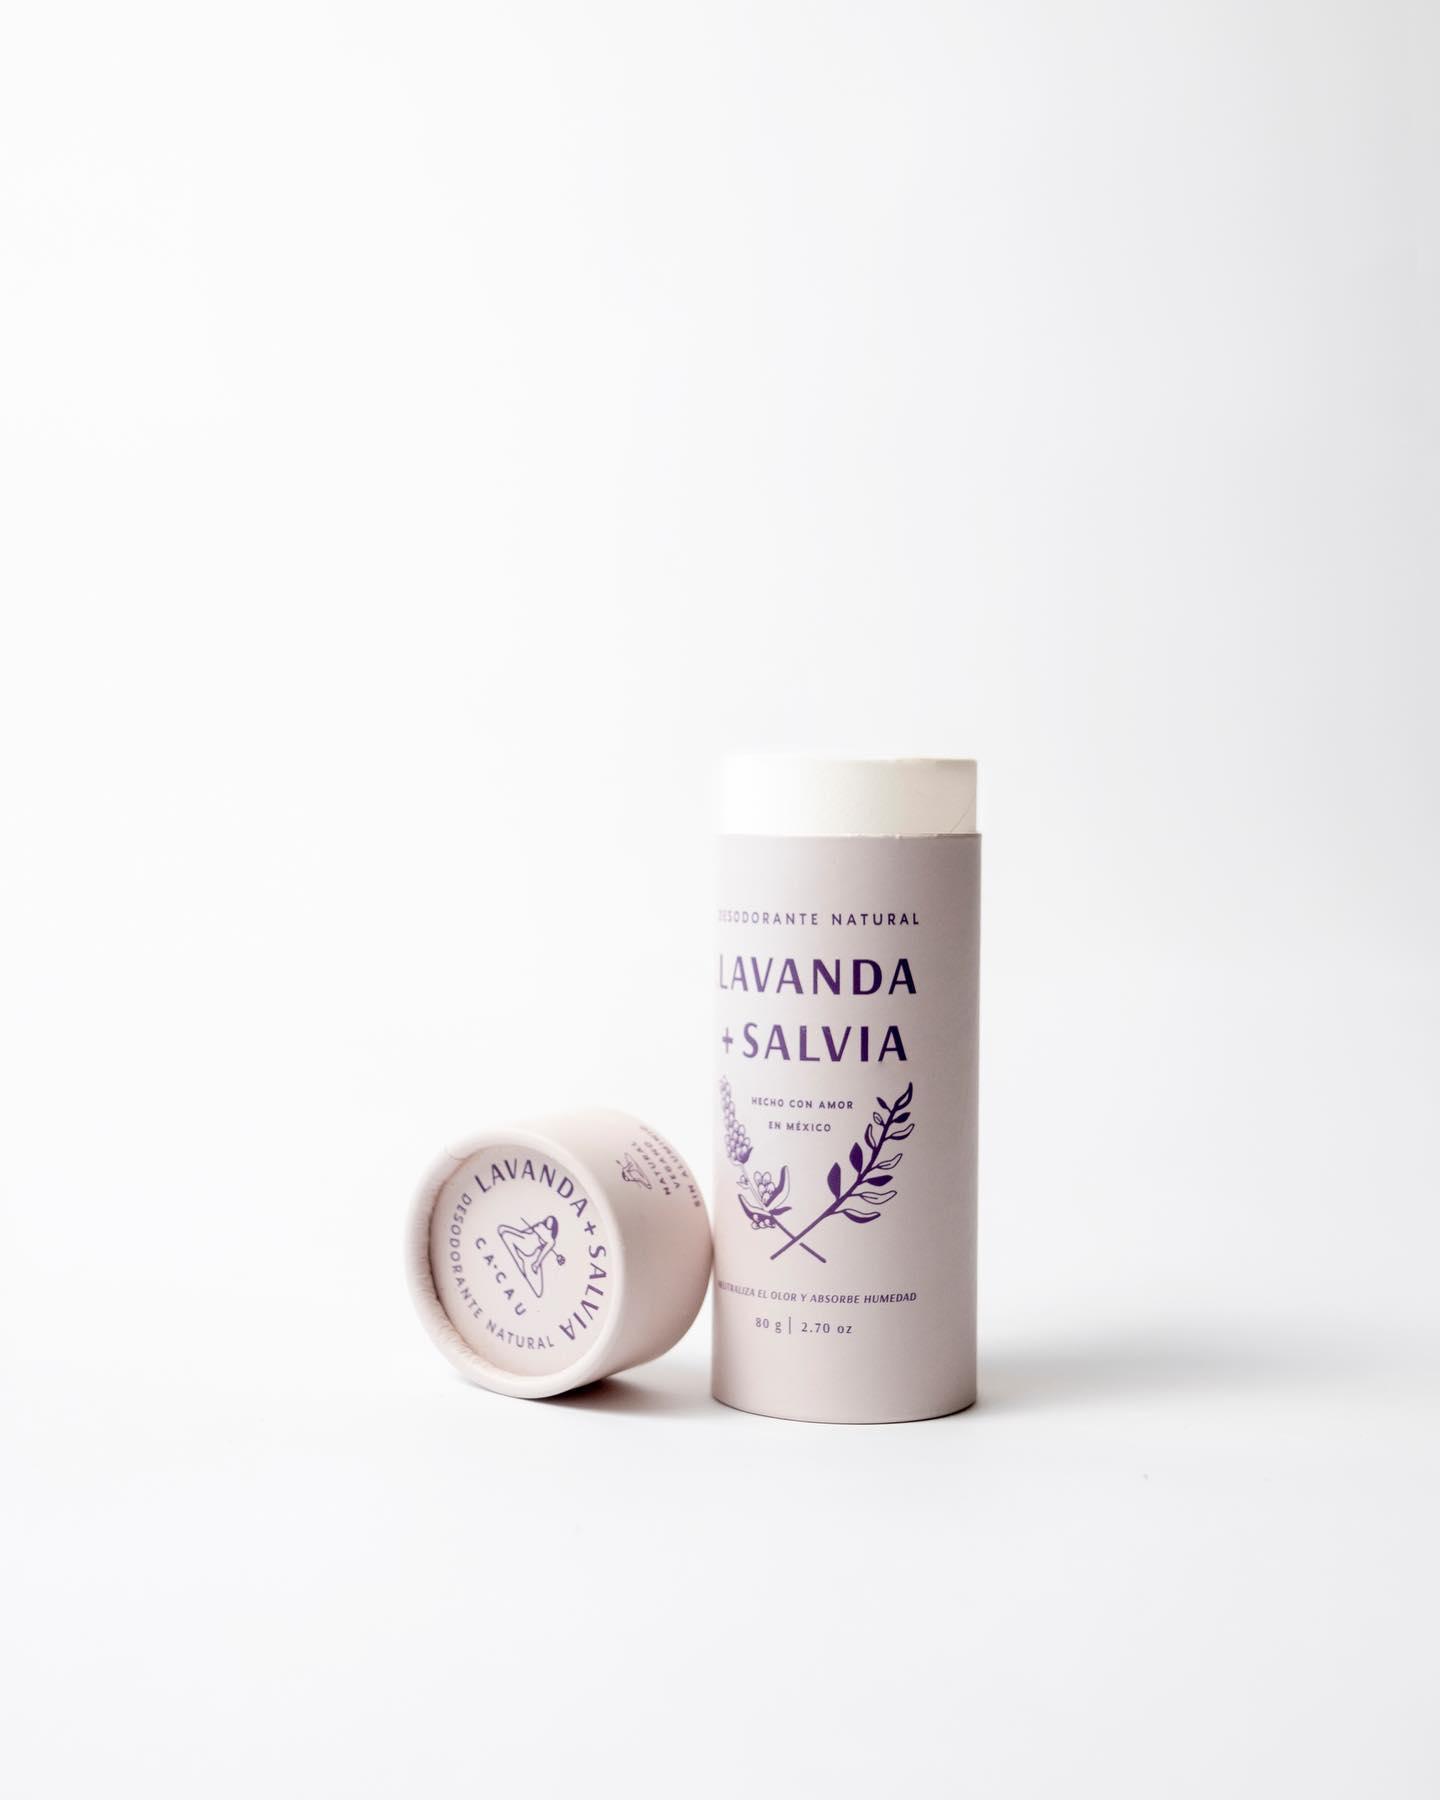 cacau-agency-naturals-cedro-desodorante-zeki-michael-design-mexico-mezcal-alcohol-hemp-cbd-deodorant-cosmetic-tube-container-branding-packaging-design-studio-freelance-creative-brand -lavendar-sage-photoshoot